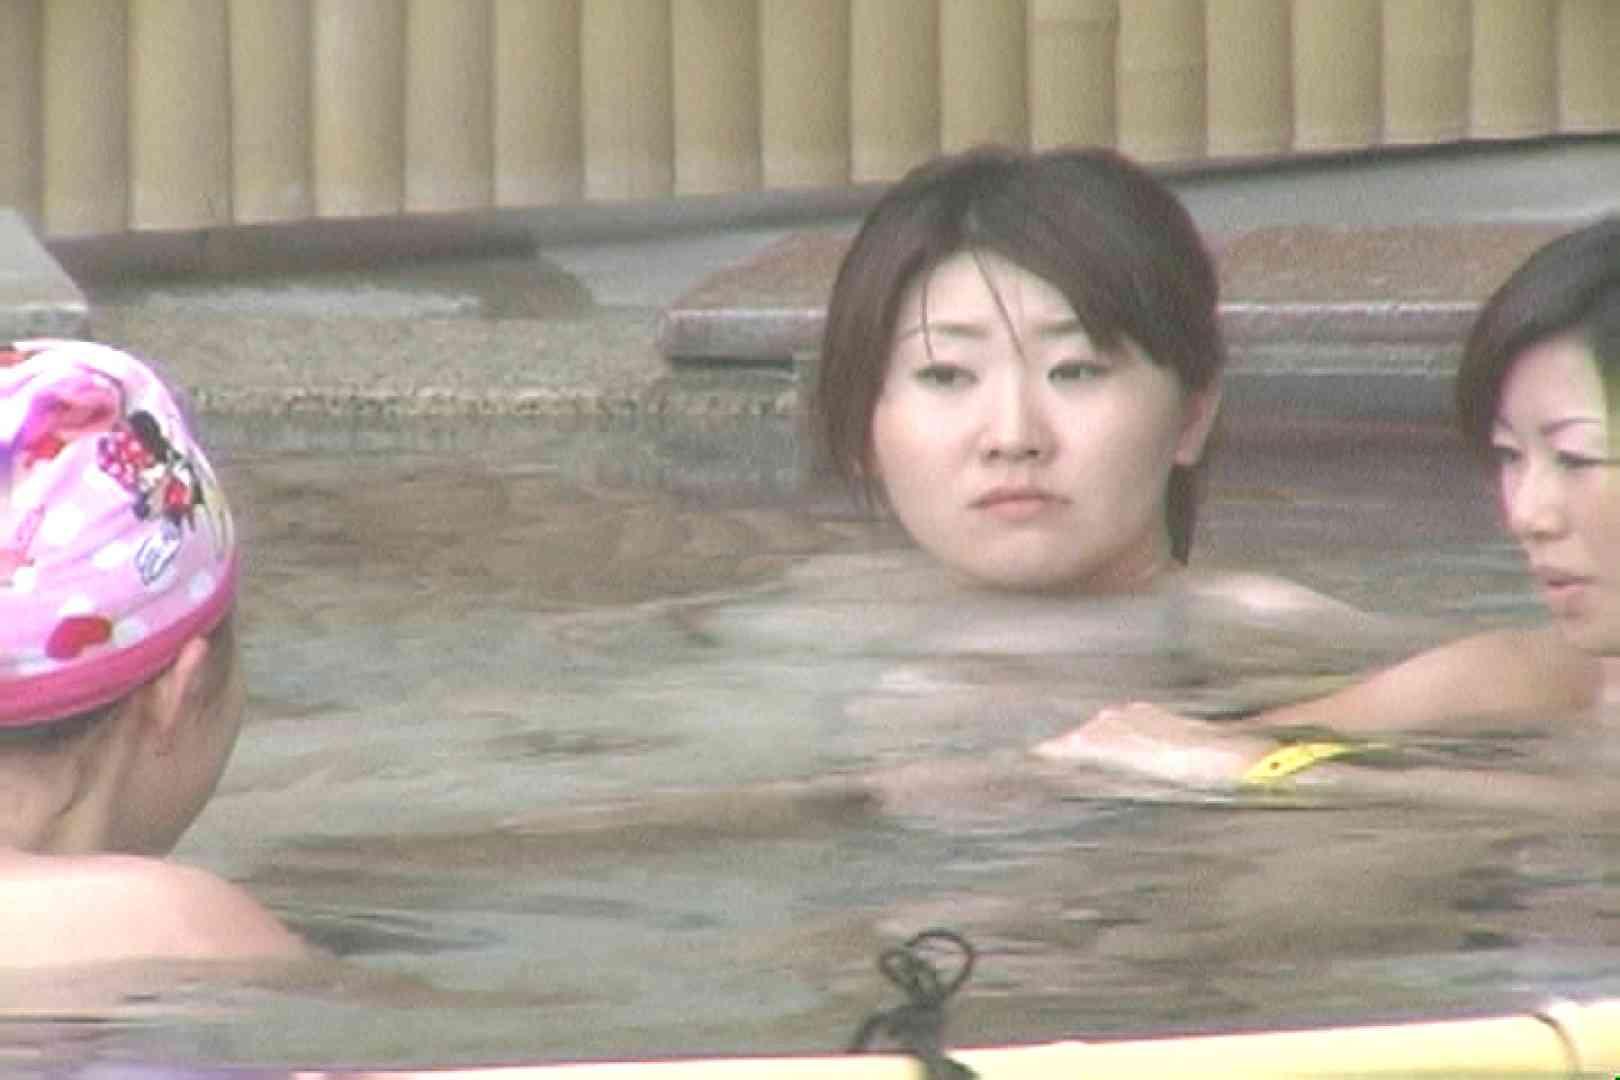 Aquaな露天風呂Vol.25 露天風呂編  91PIX 84